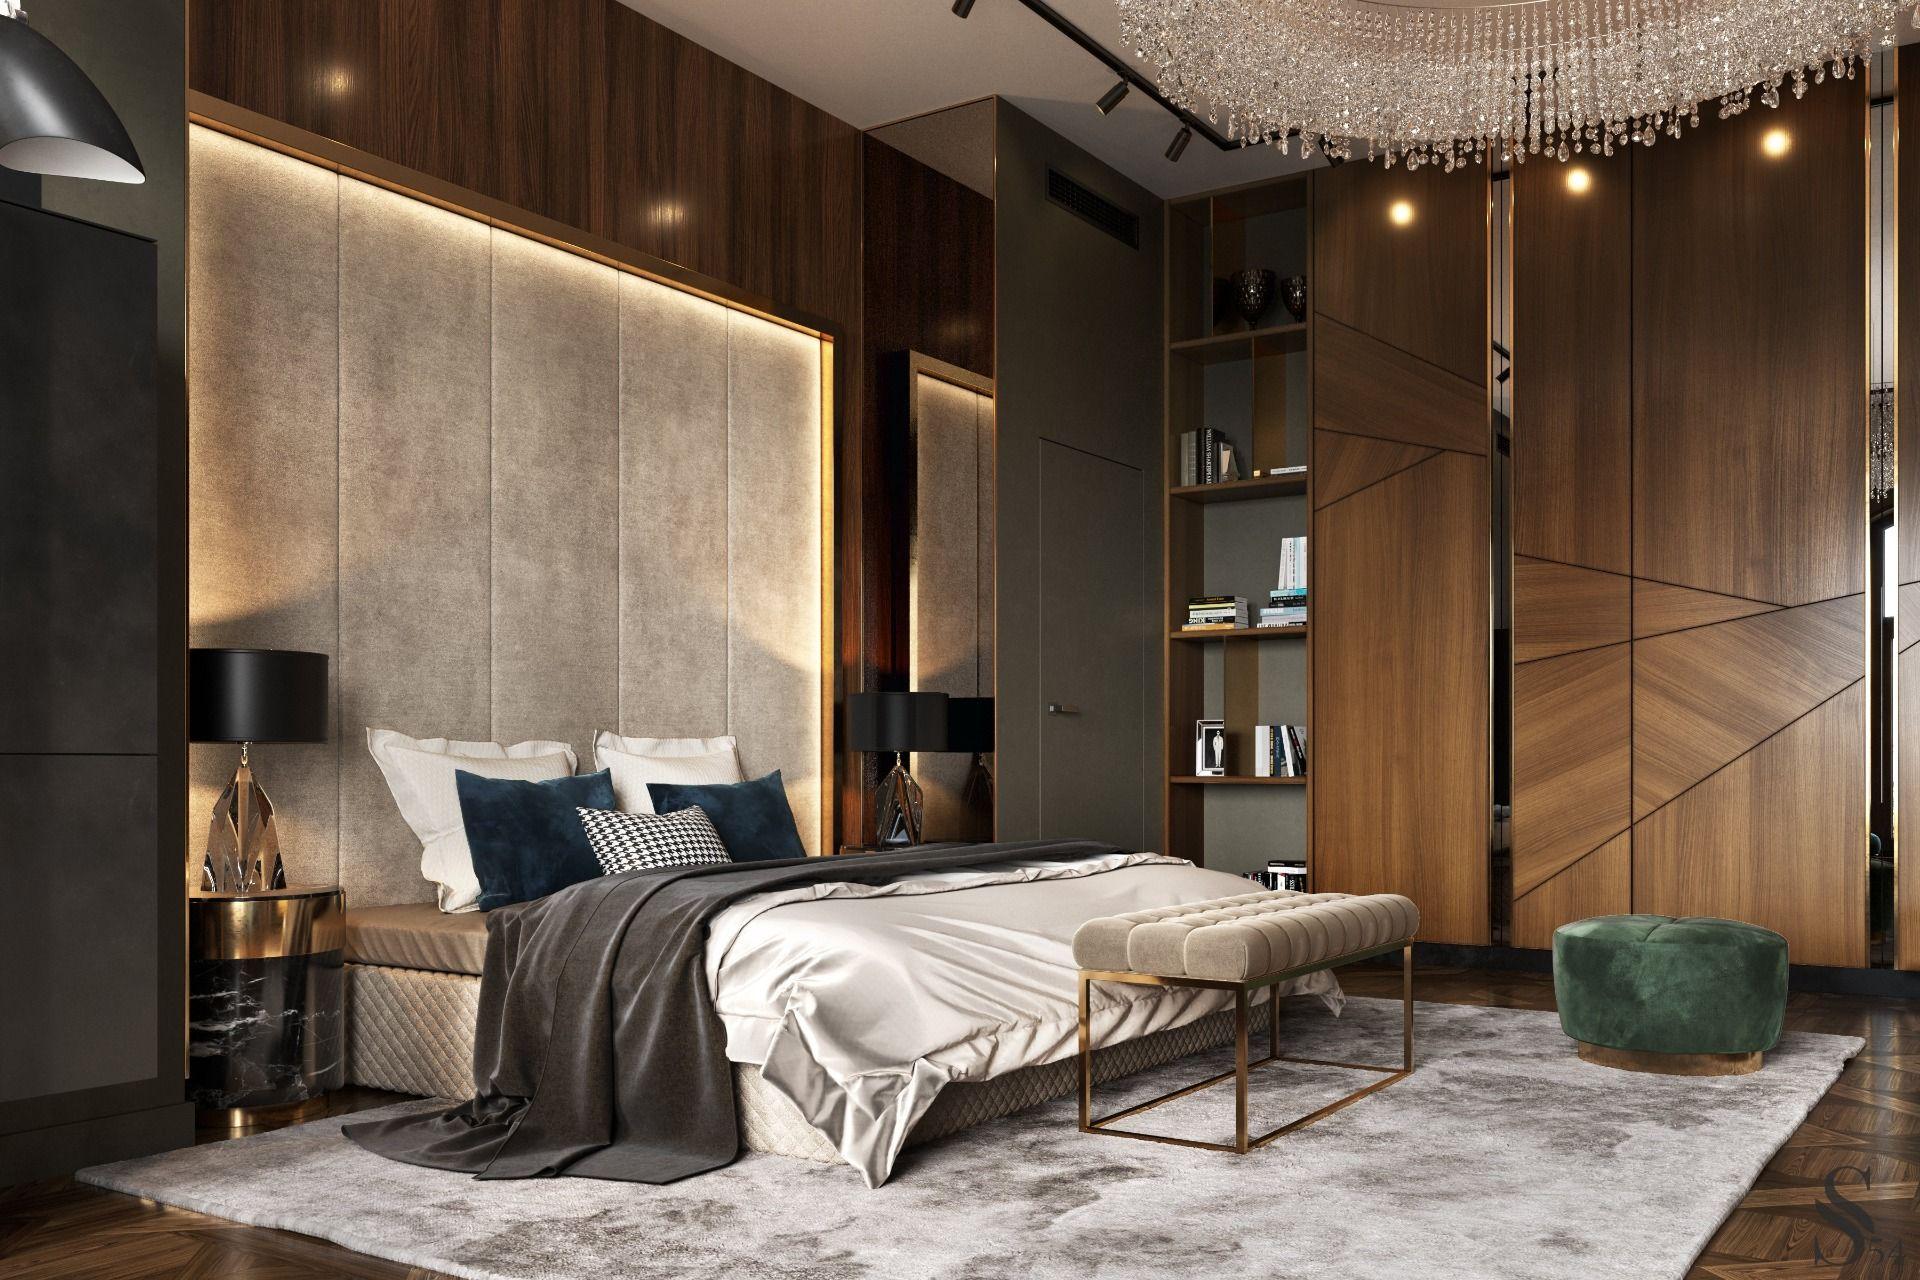 Yet Another Stunning Project By Studia 54 Luxury Bedroom Master Luxurious Bedrooms Master Bedroom Interior Interior designing bedroom photos